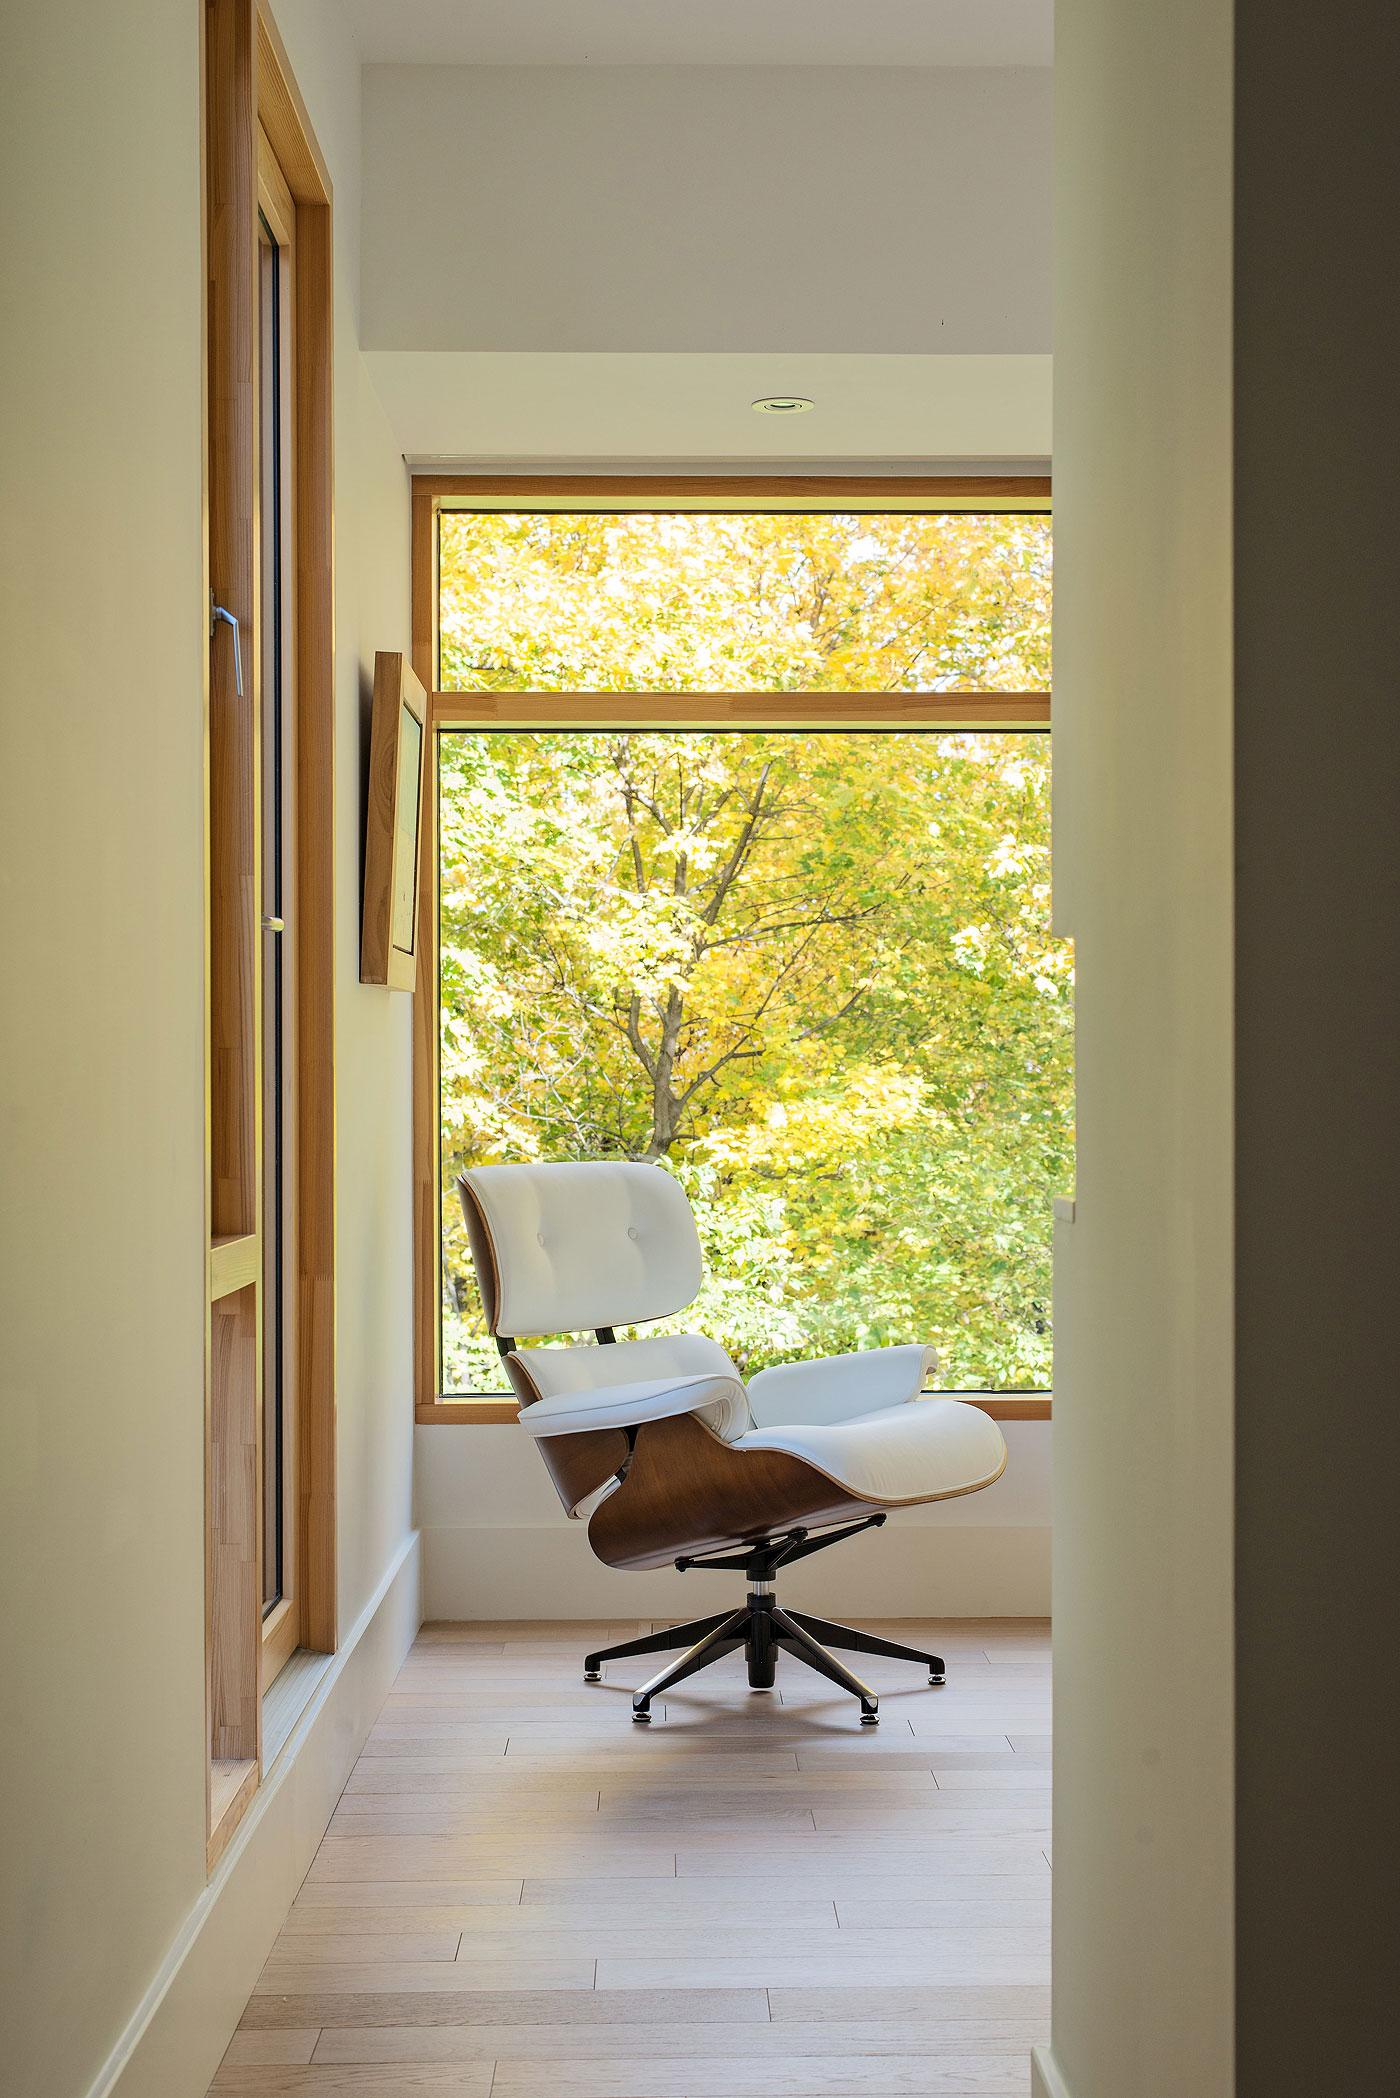 residencia-heathdale-tact-architecture-design (7)